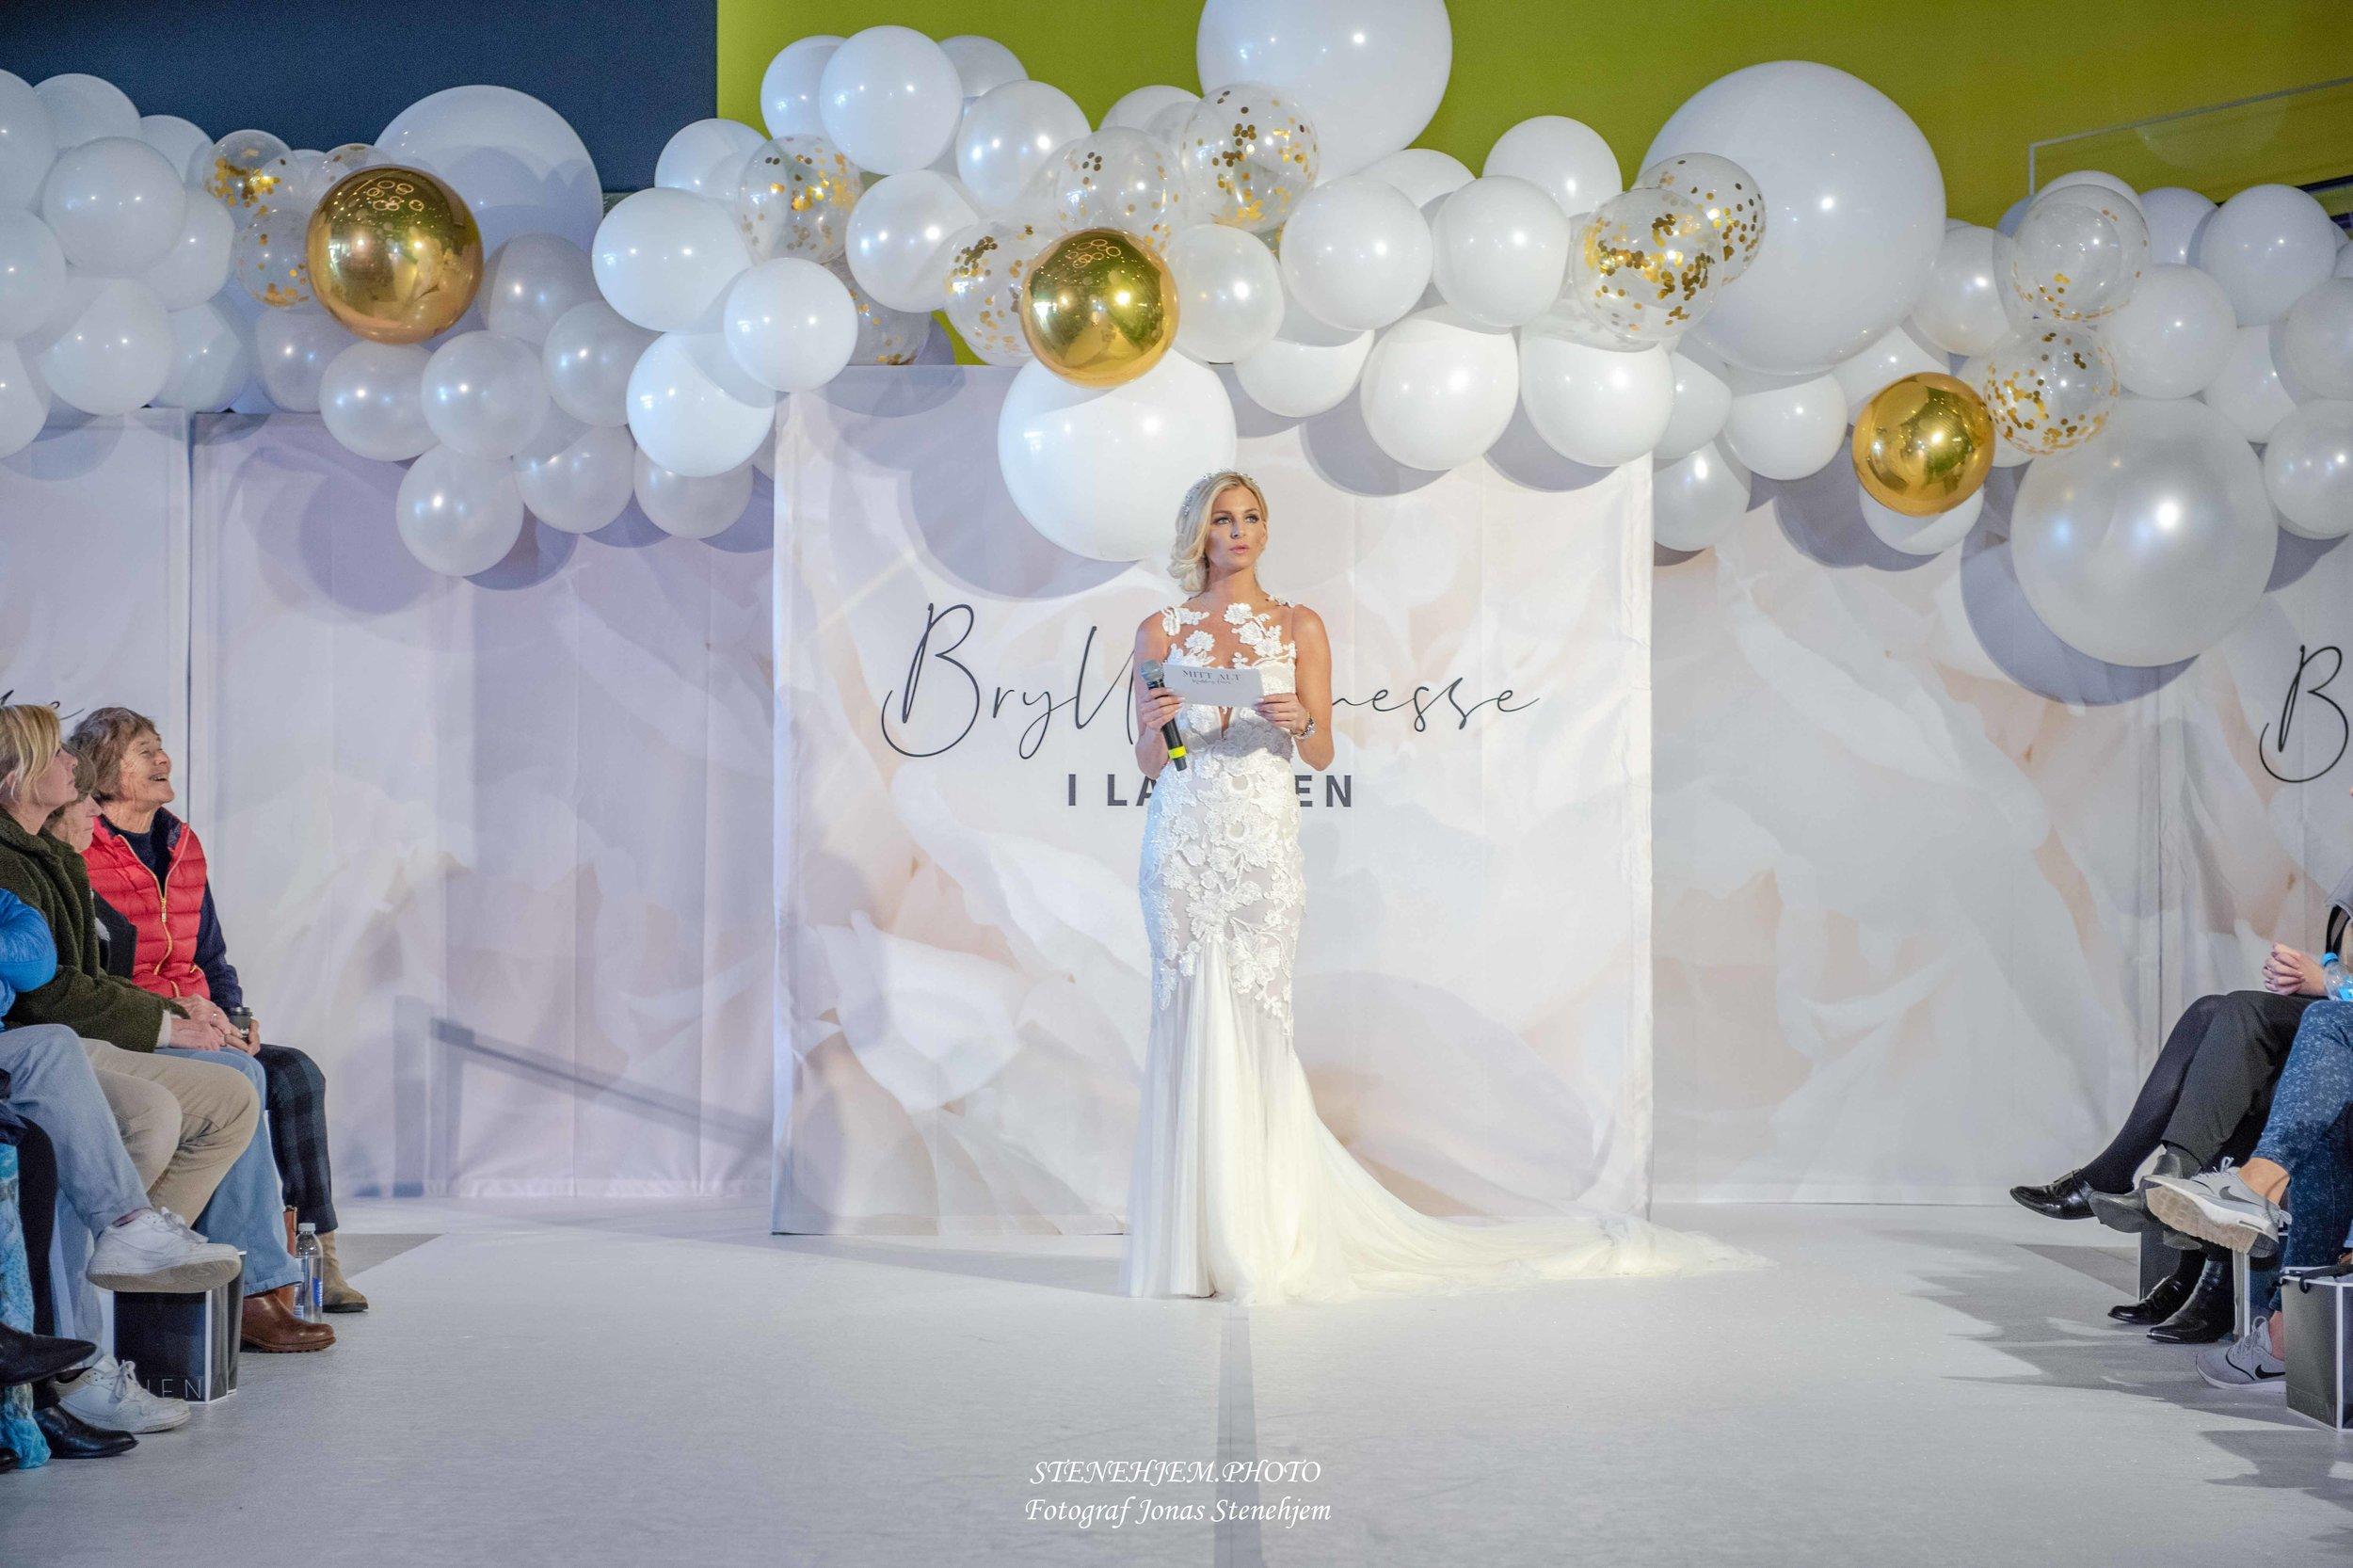 Bryllupsmesse_Lagunen_mittaltweddingfair__027.jpg